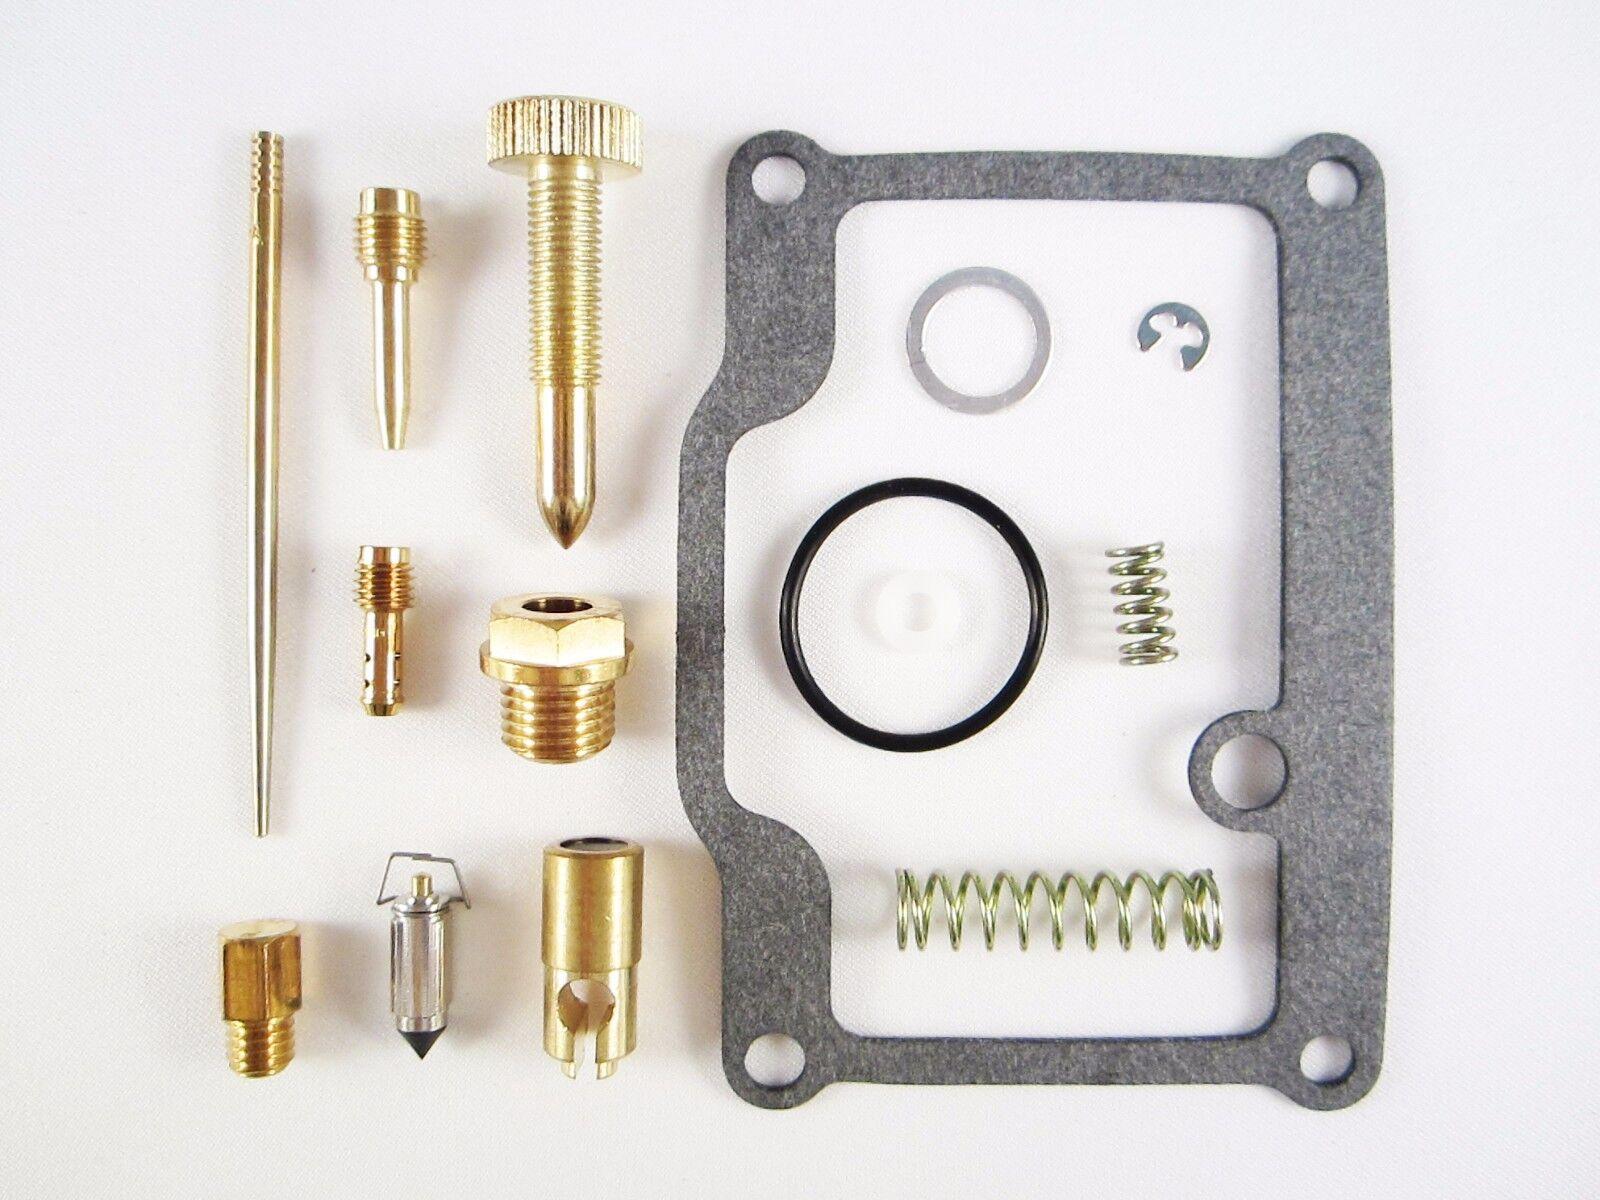 Polaris Carburetor Rebuild Repair Kit 2x4 4x4 300 94-95 Xplorer Xpress 300 96-99